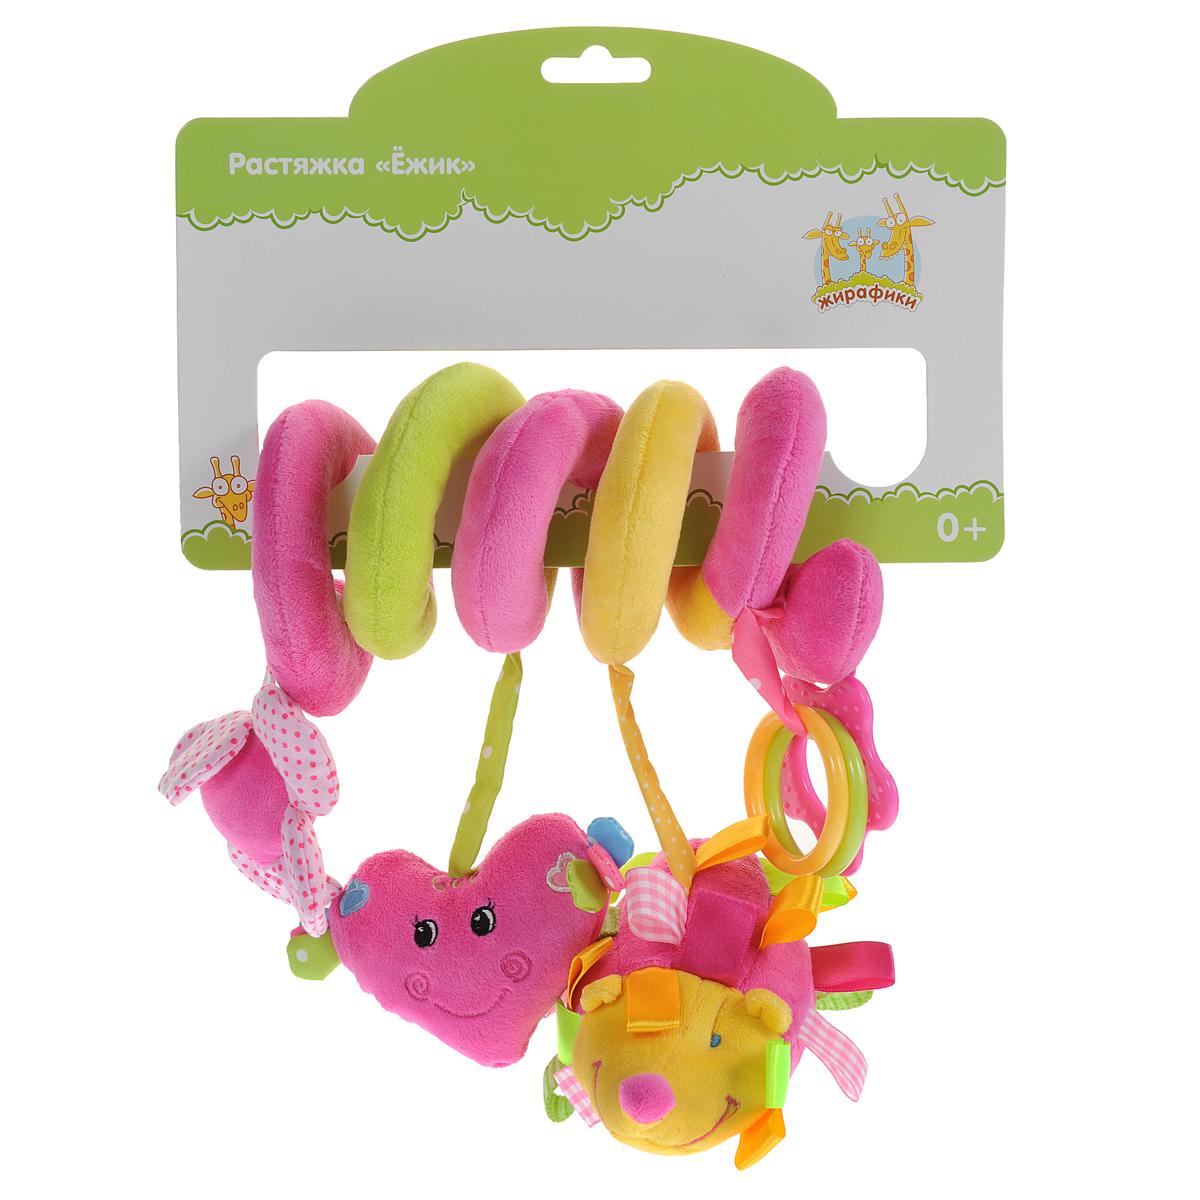 Развивающая игрушка-подвеска на кроватку Жирафики Ежик